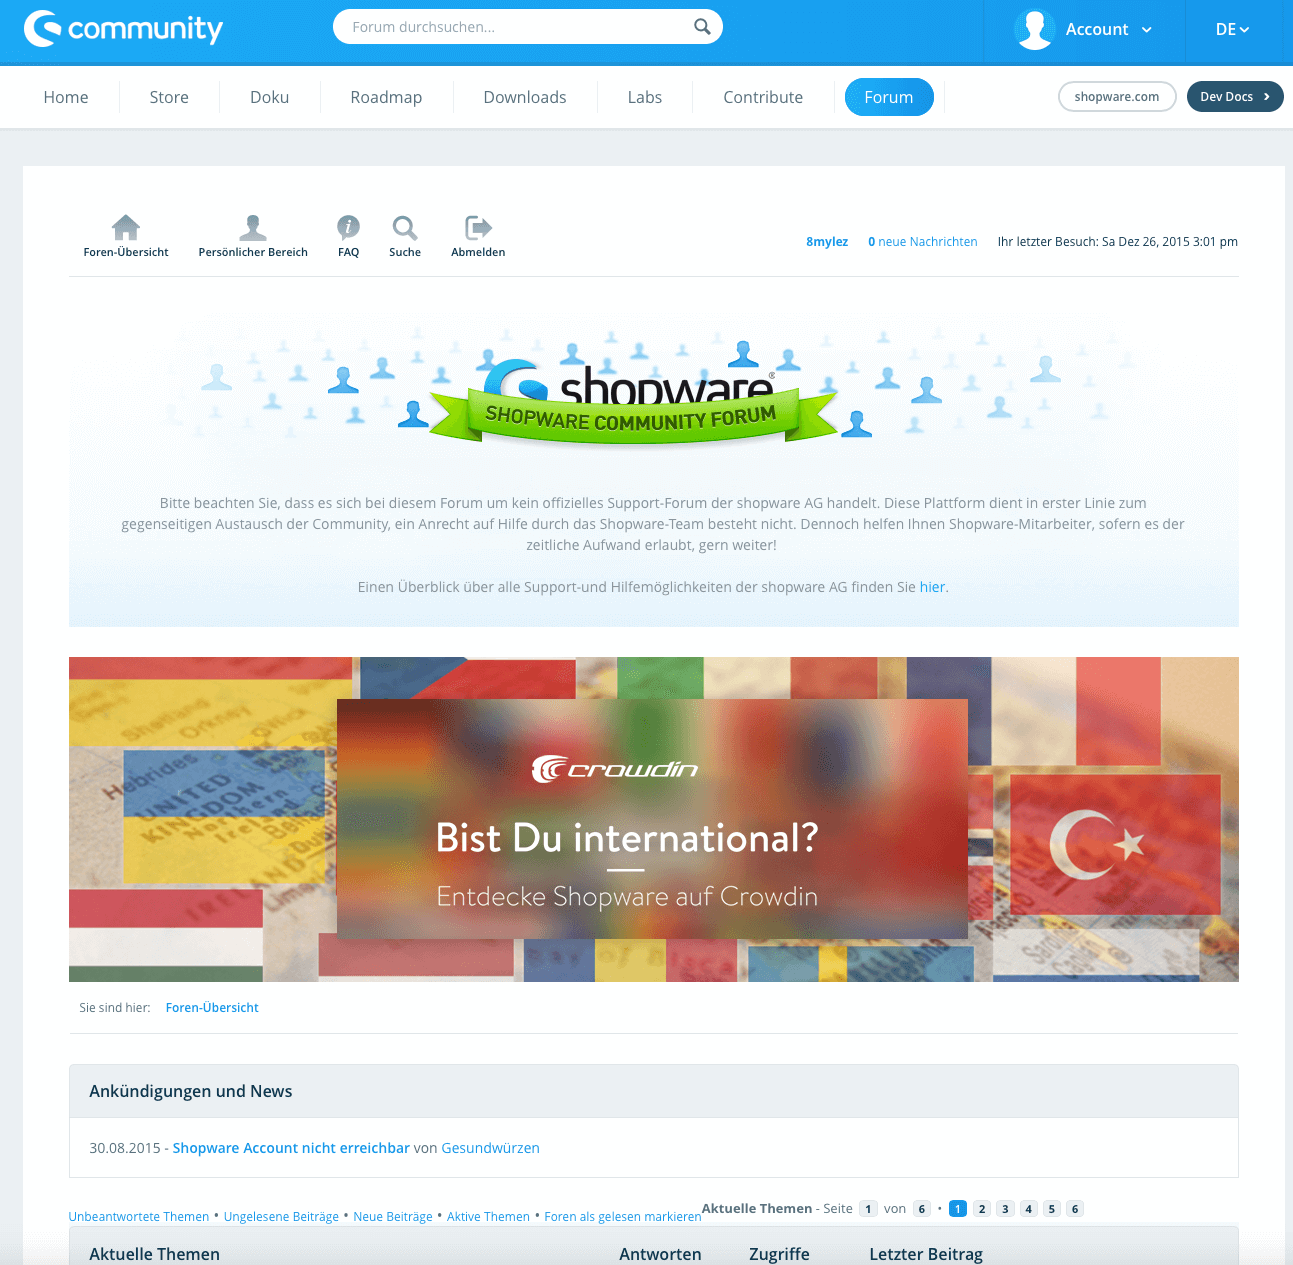 Shopware Community Forum